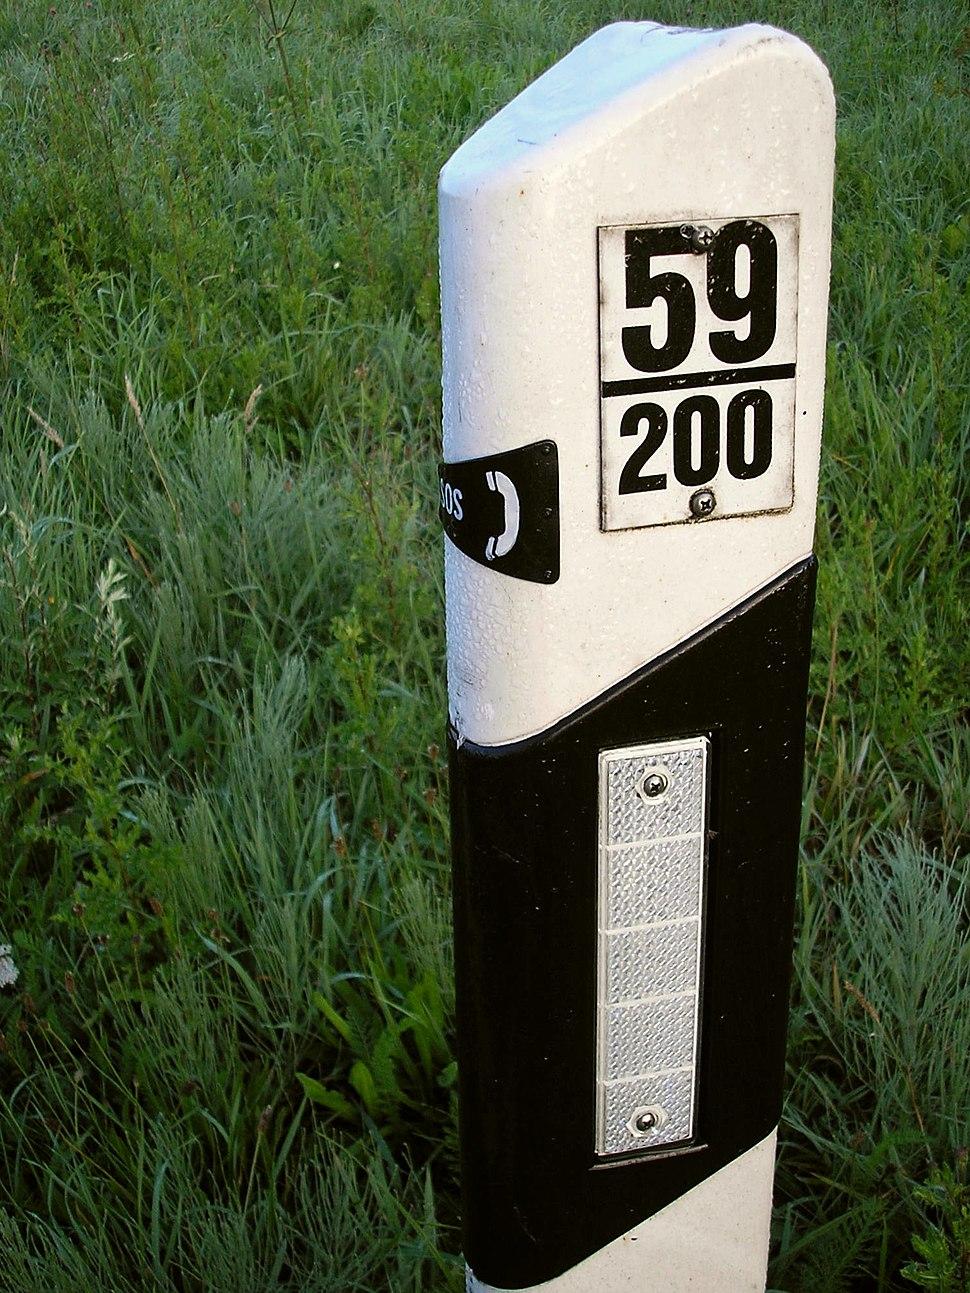 HectoReflecto D 59k200